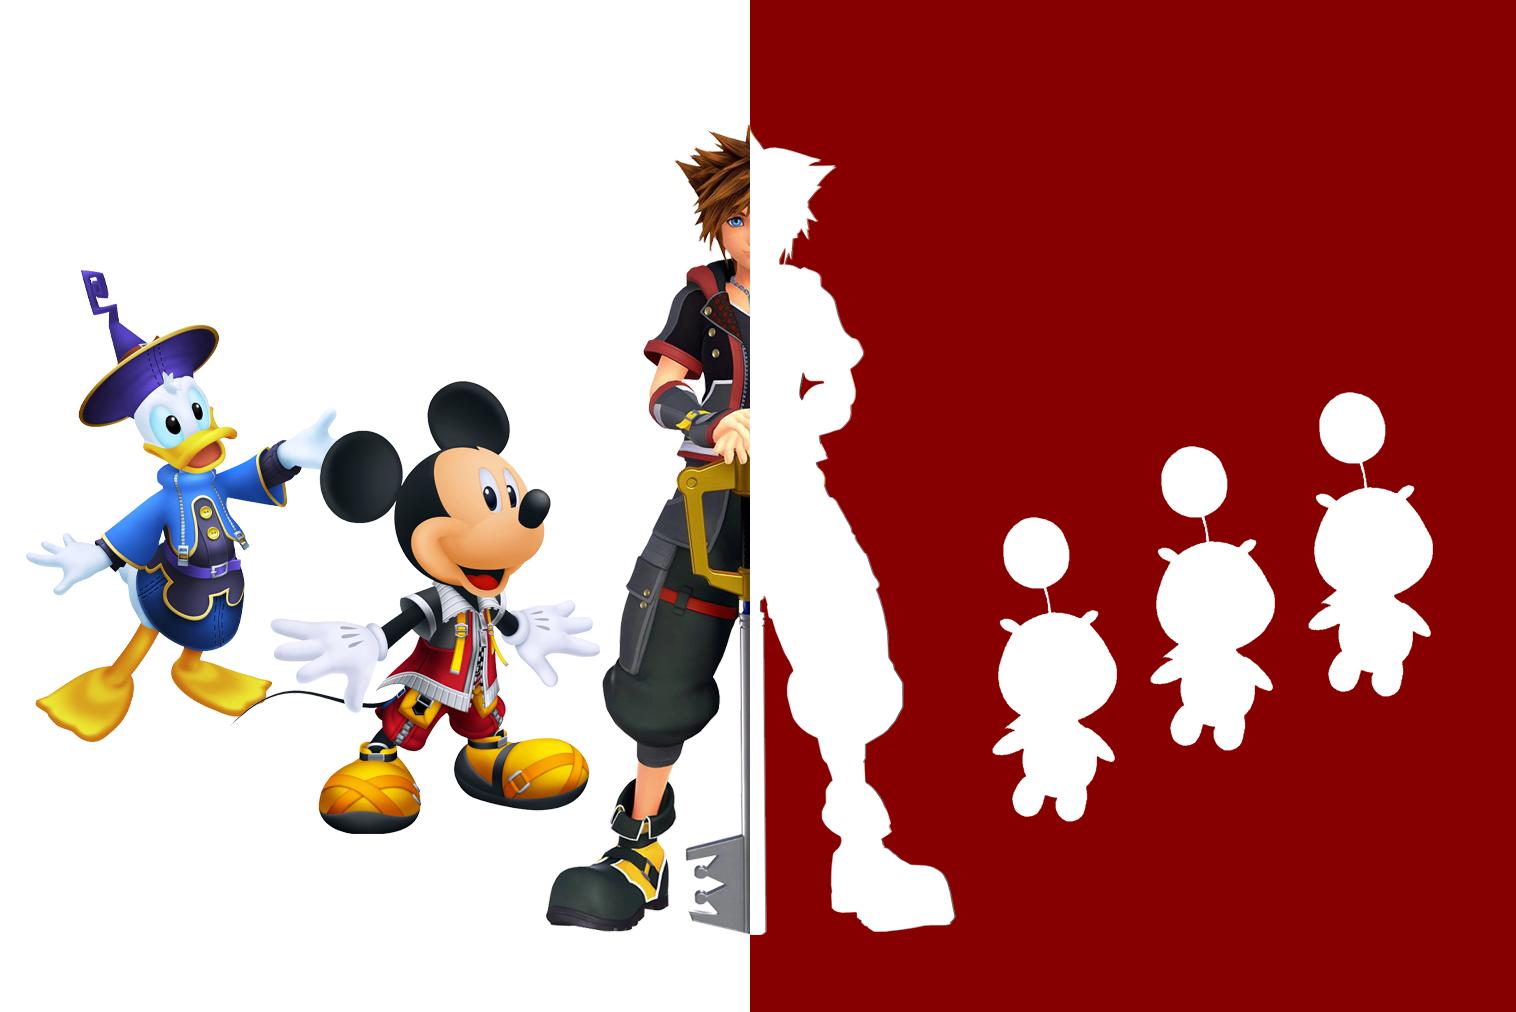 KINGDOM HEARTS III: Disney's Latest Remake - Merry-Go-Round